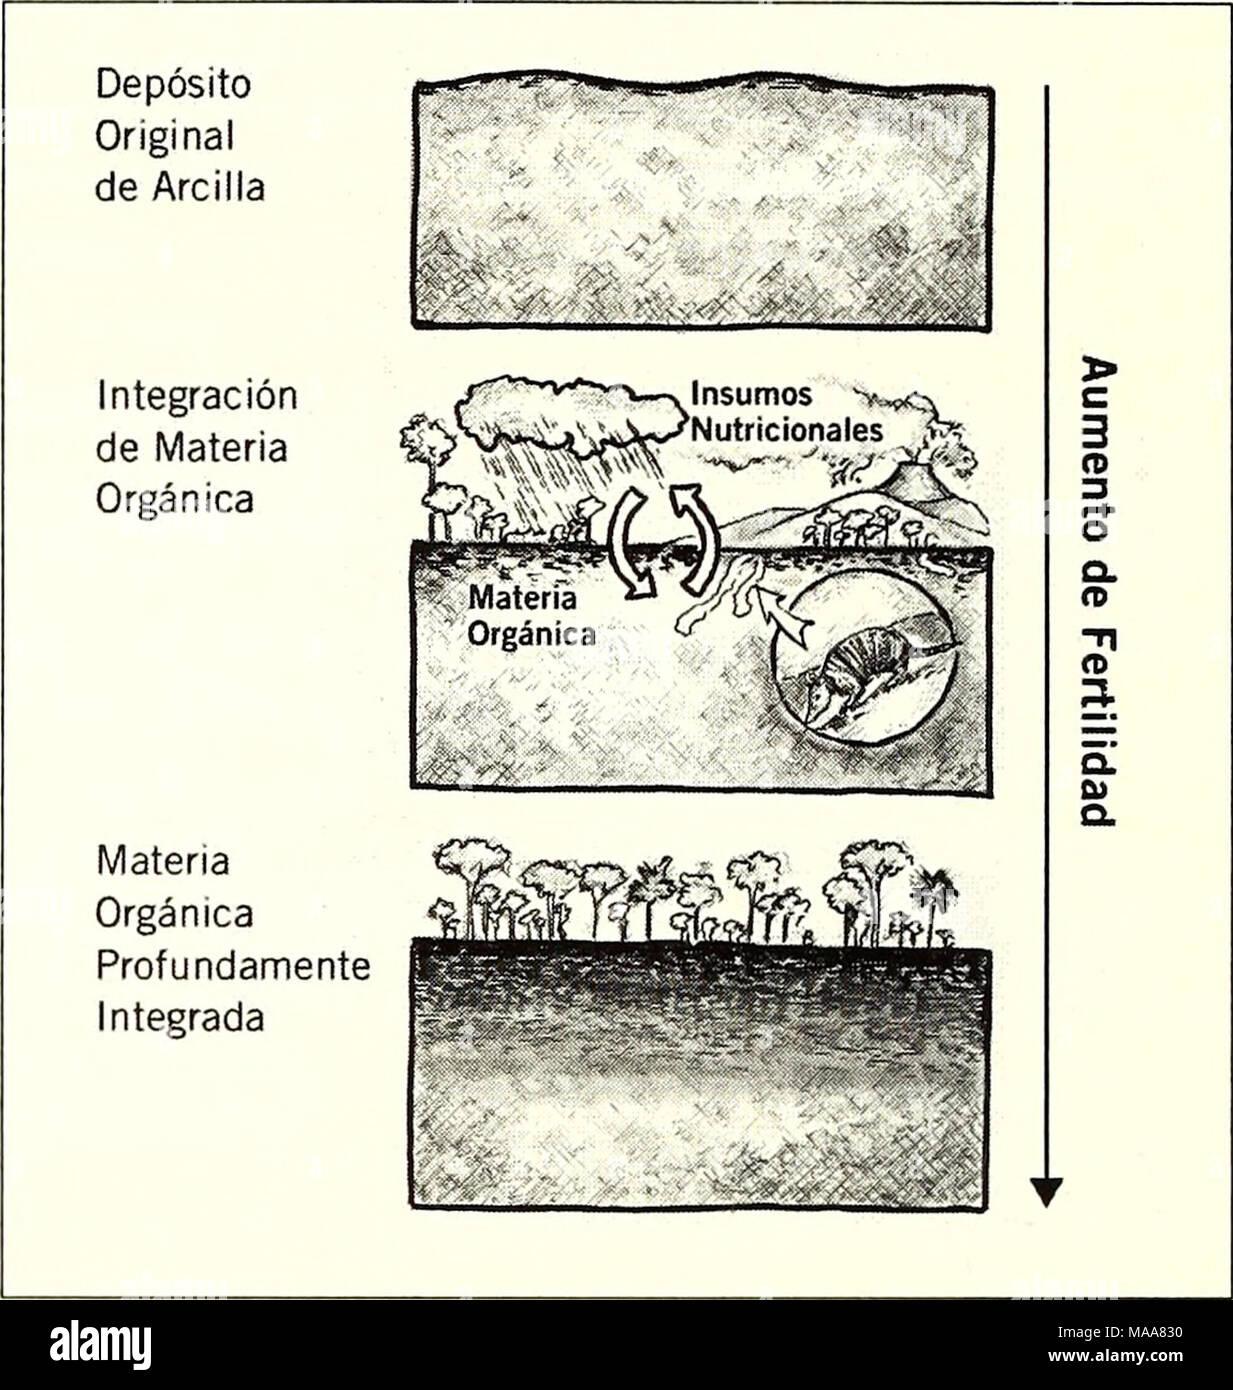 . Ecuador, Perú : Cuyabeno-Güeppí . 72 RAPID BIOLOGICAL AND SOCIAL INVENTORIES INFORME/REPORT NO. 20 - Stock Image